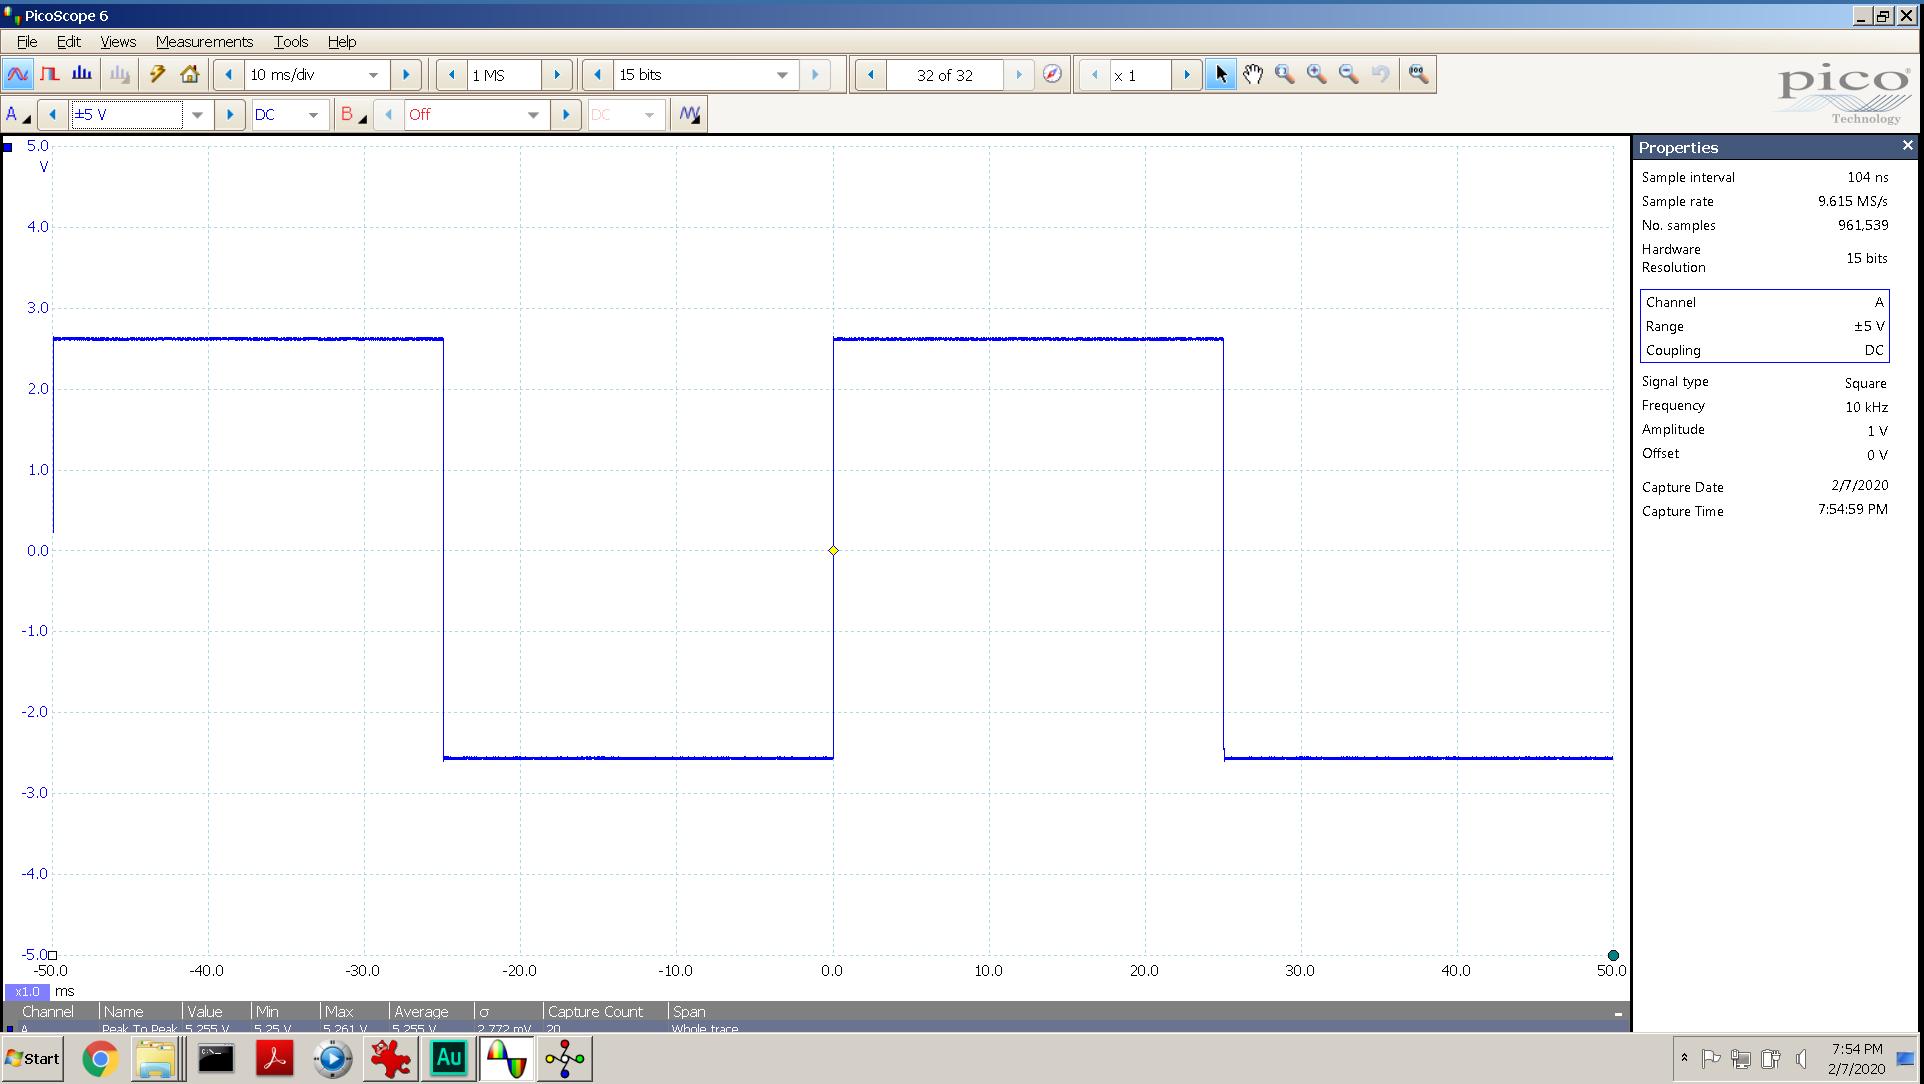 20200207-01 KTE May 20 Hz sqr -4 dBFS 5 Vpp 10mS div SE - ASIO - NOS.png